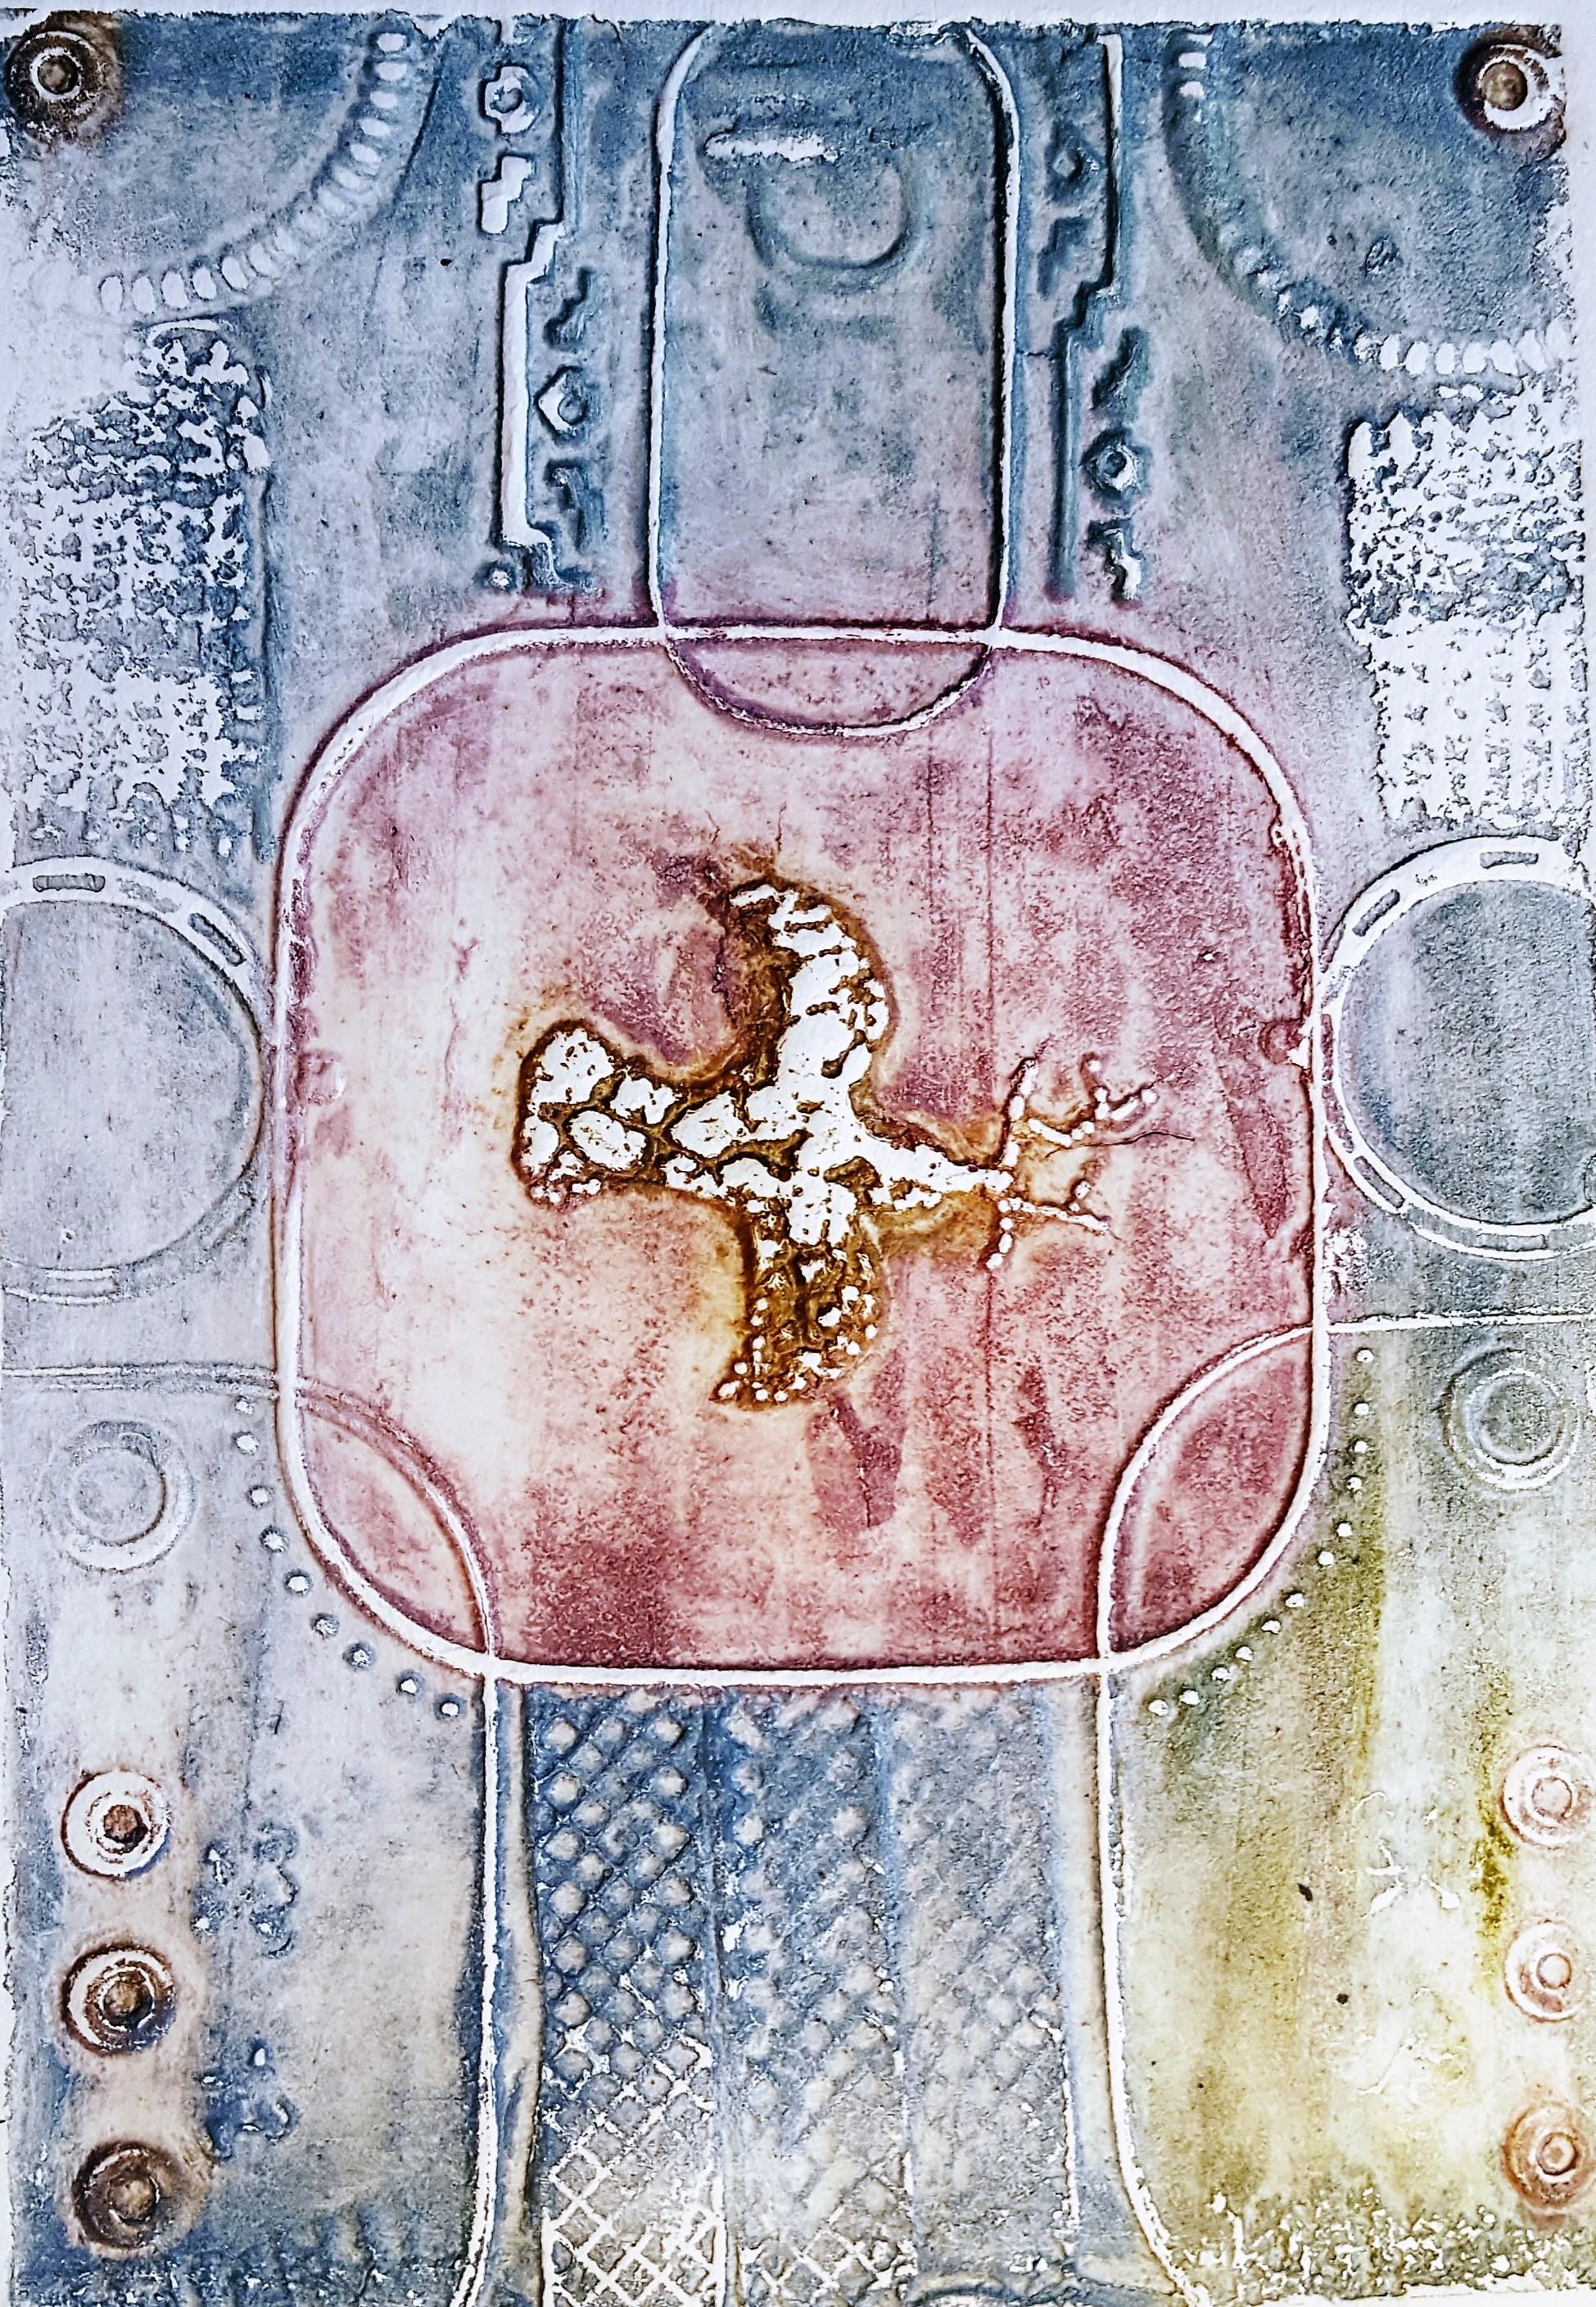 gravure jean michel glasman www.designer-ceramiste (4)